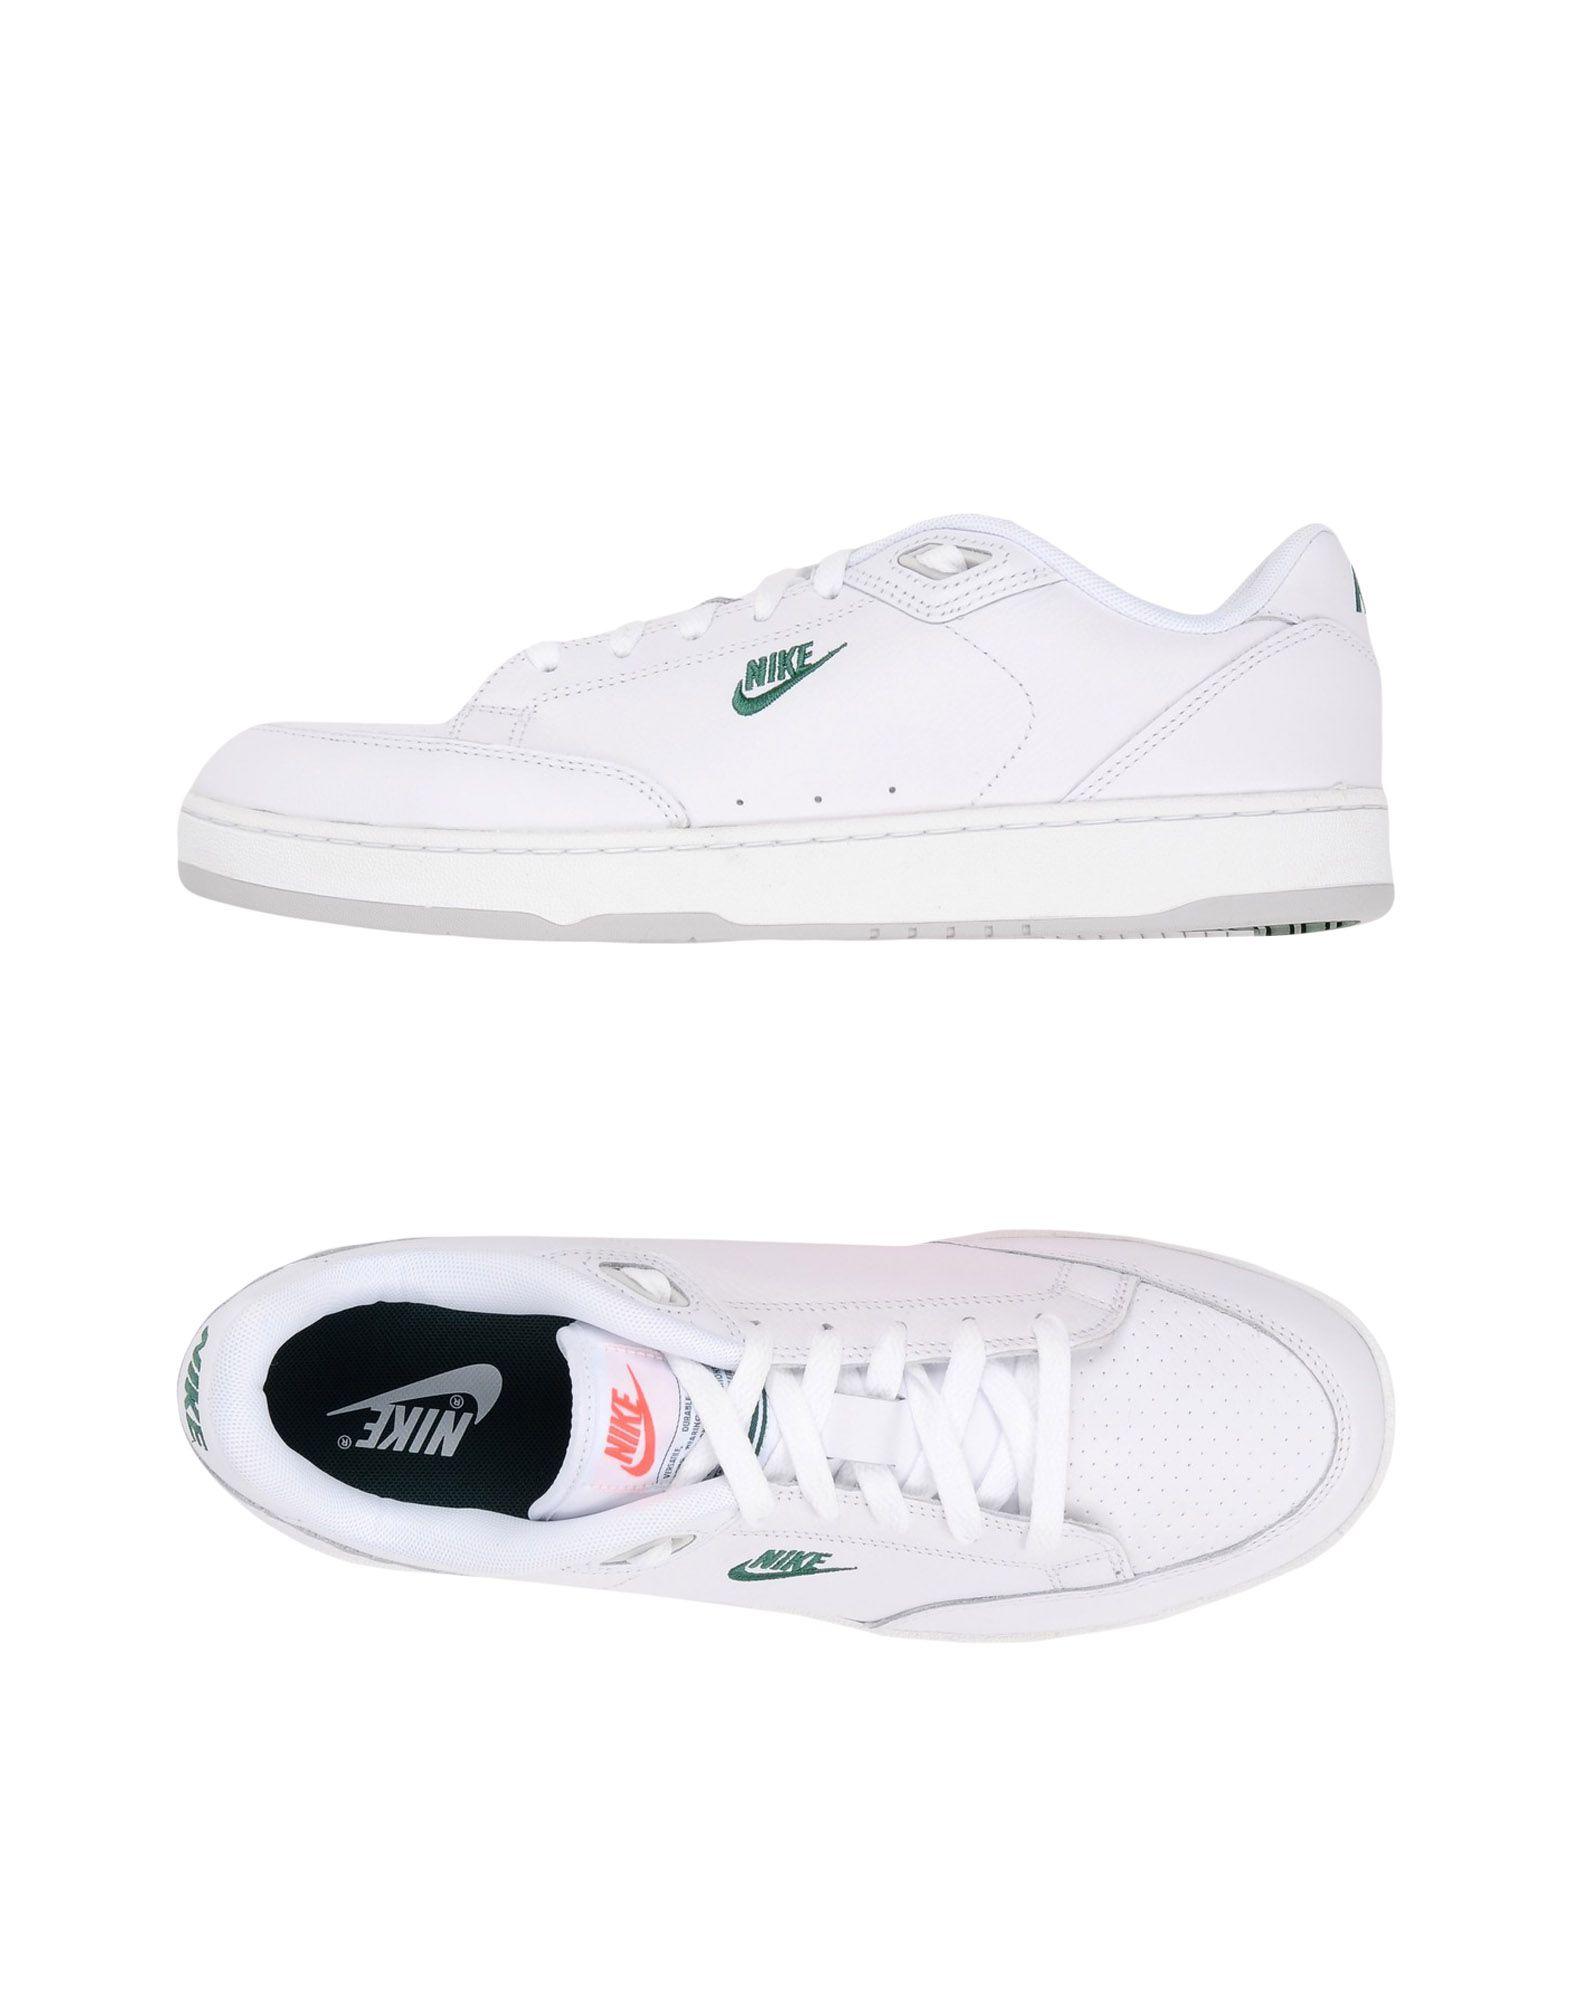 Nike Grandstand Ii Premium - Sneakers - on Men Nike Sneakers online on -  United Kingdom - 11431267AT 233fa1